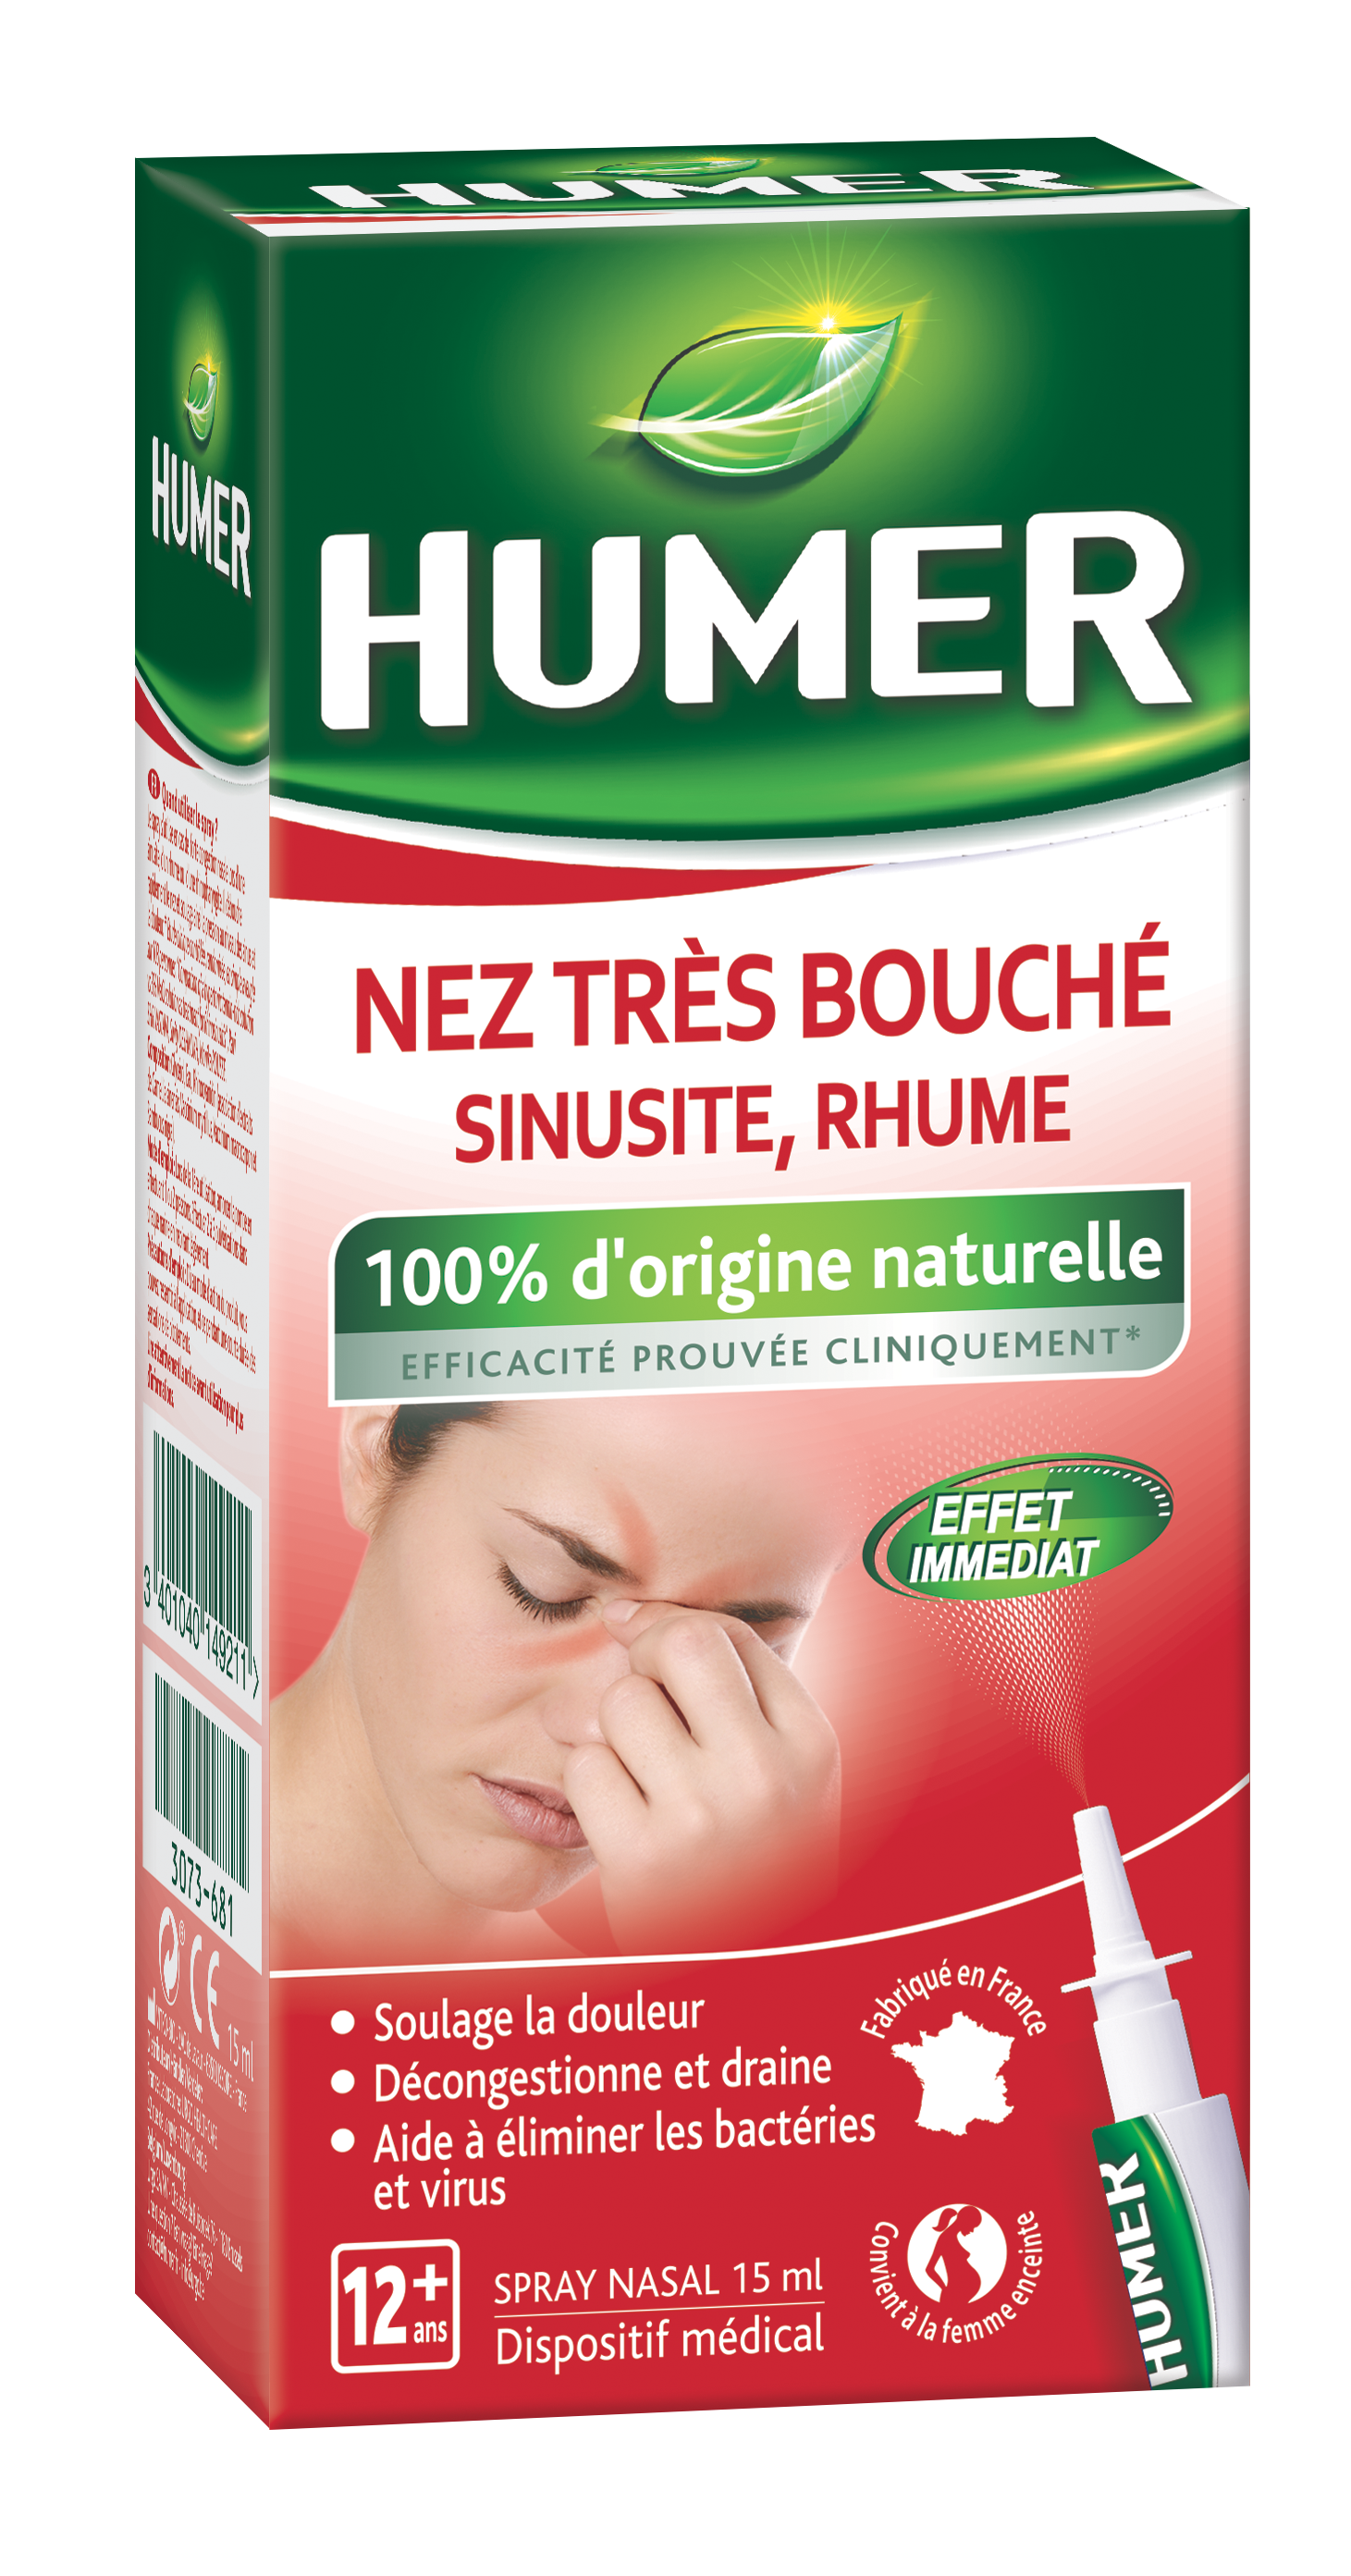 Image HUMER NEZ TRES BOUCHE S nas hypertonique extrait plantes Spray/15ml